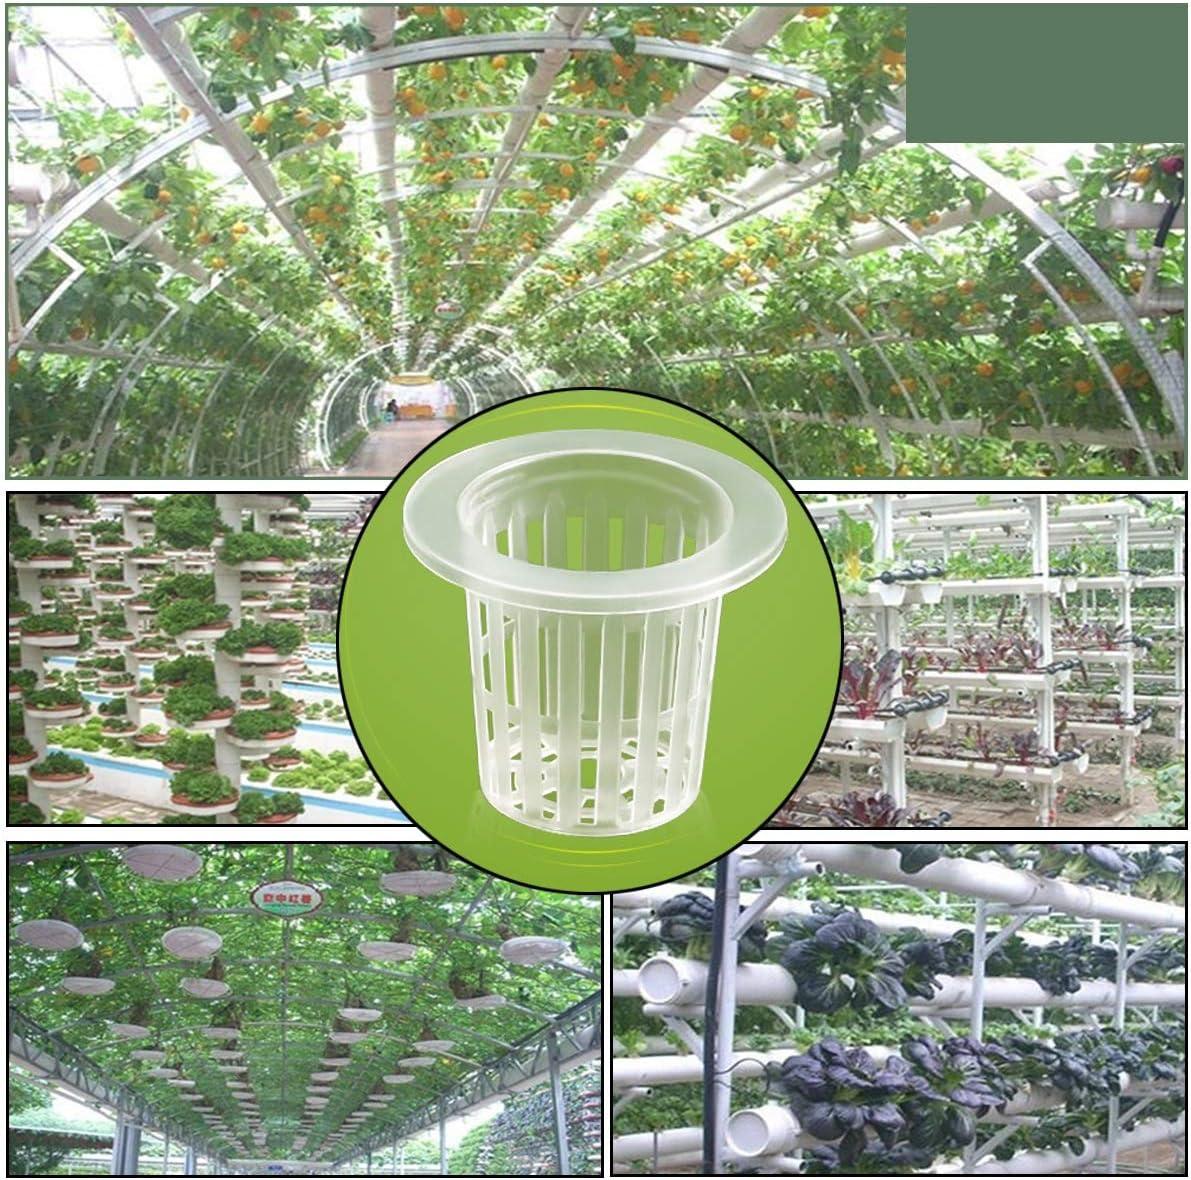 HiodFhip Garden Plastic Net Cups,30 Pack 2 Inch Planting Basket Cup Set, Garden Slotted Mesh Heavy Duty Wide Lip Design Net Pots for Hydroponics Aquaponics Orchids